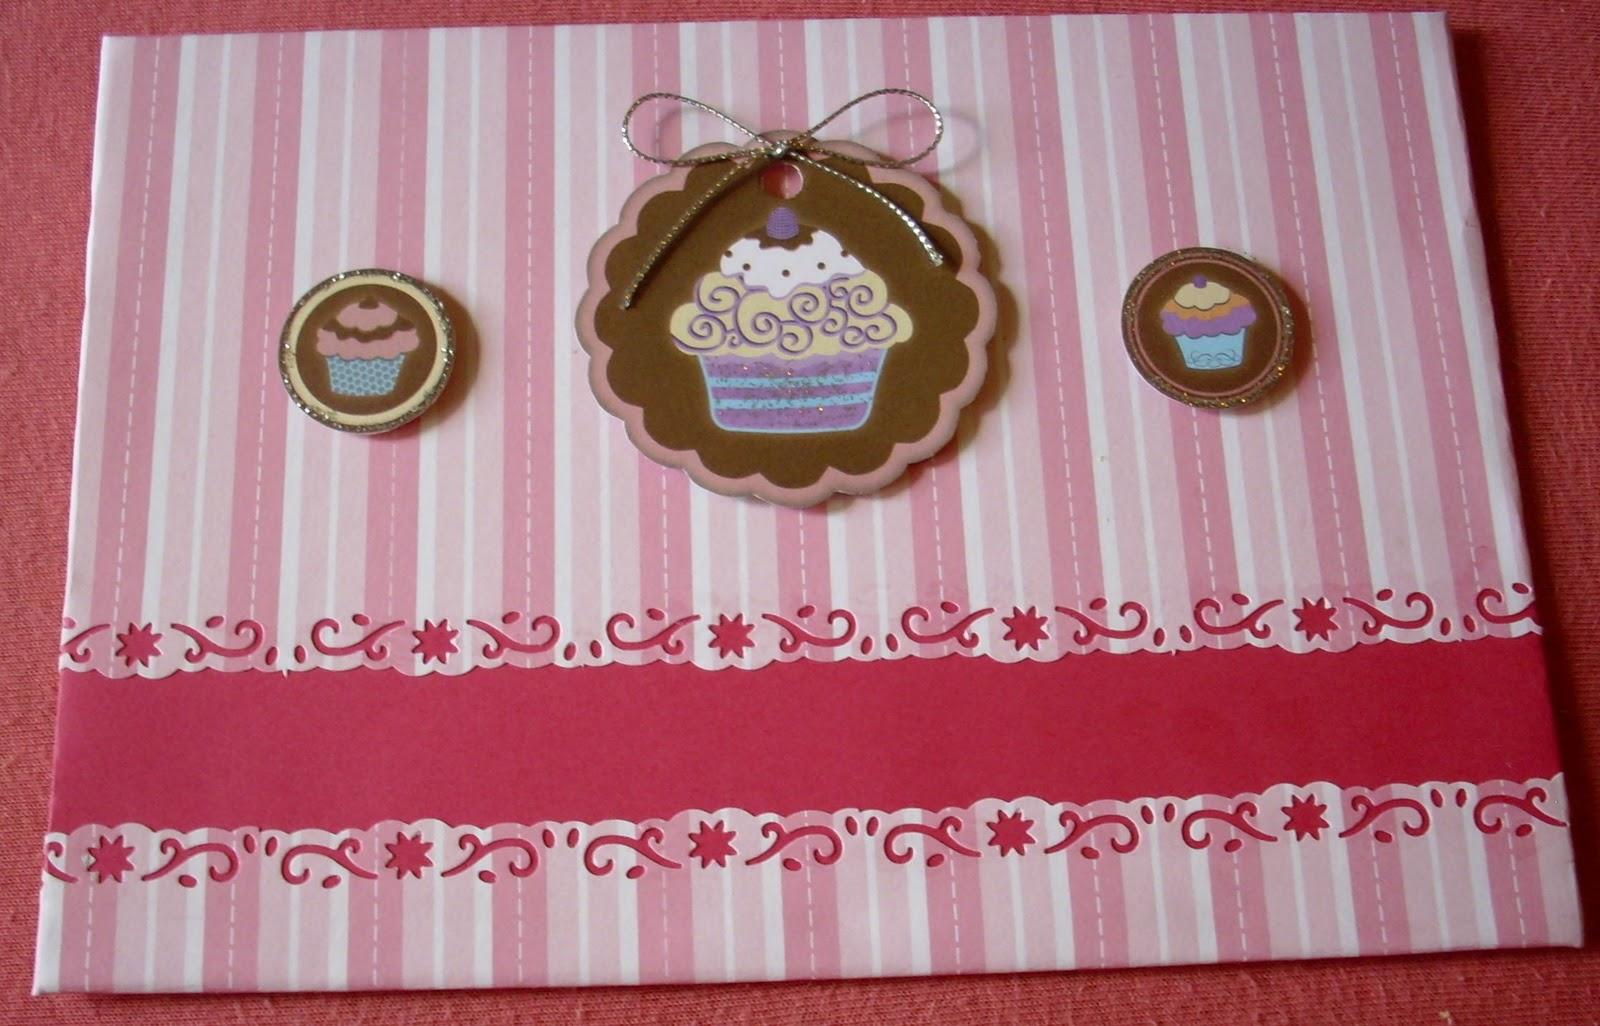 http://4.bp.blogspot.com/-tbGEhWn5XJQ/TWLZ1hFK2MI/AAAAAAAAADk/vJgNS5wojmw/s1600/candy+paper+083.jpg